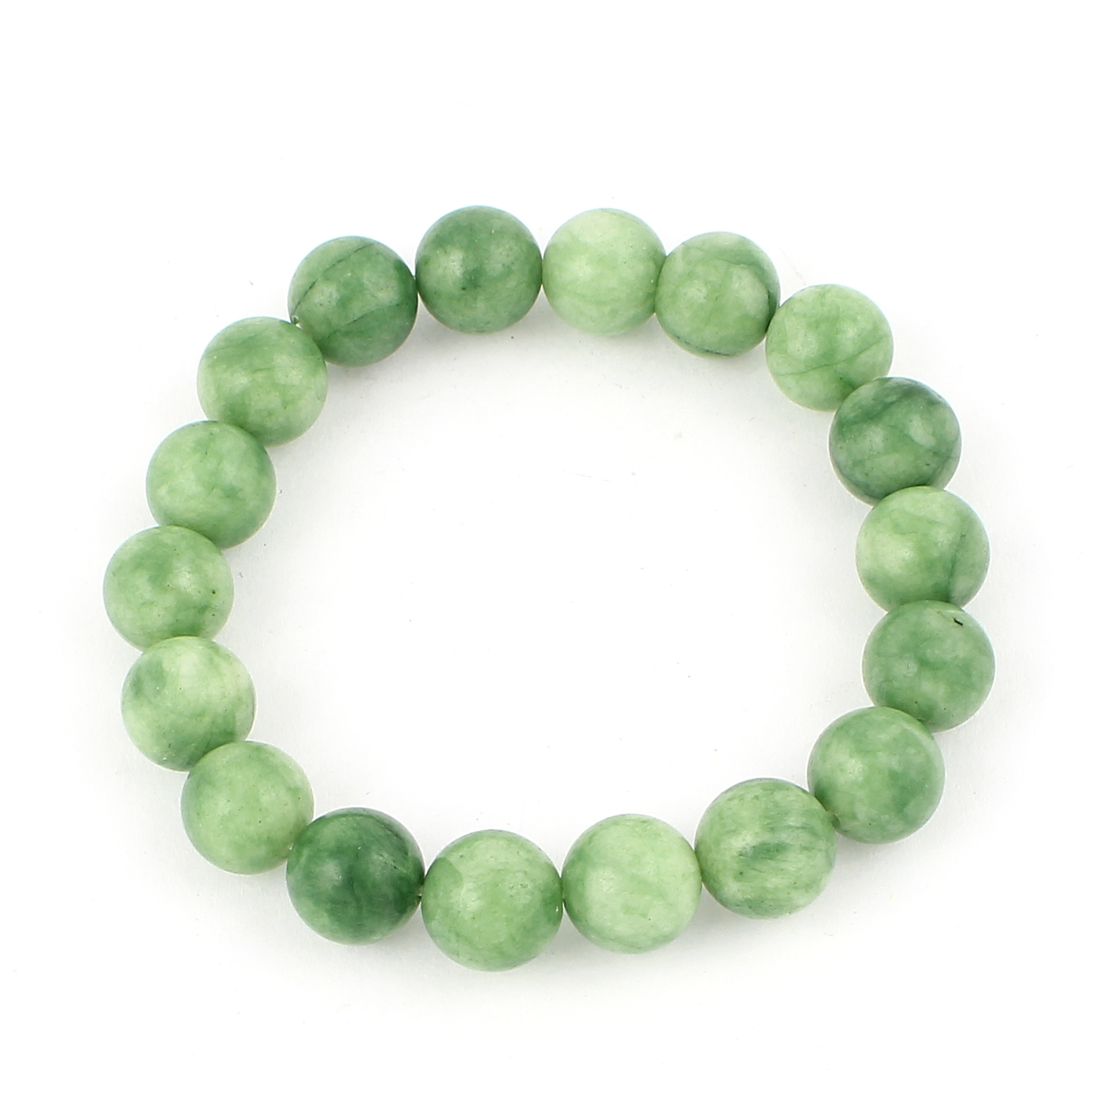 Lady Jewelry Round Faux Jade Beads Decor Elastic Wrist Bangle Bracelet Green